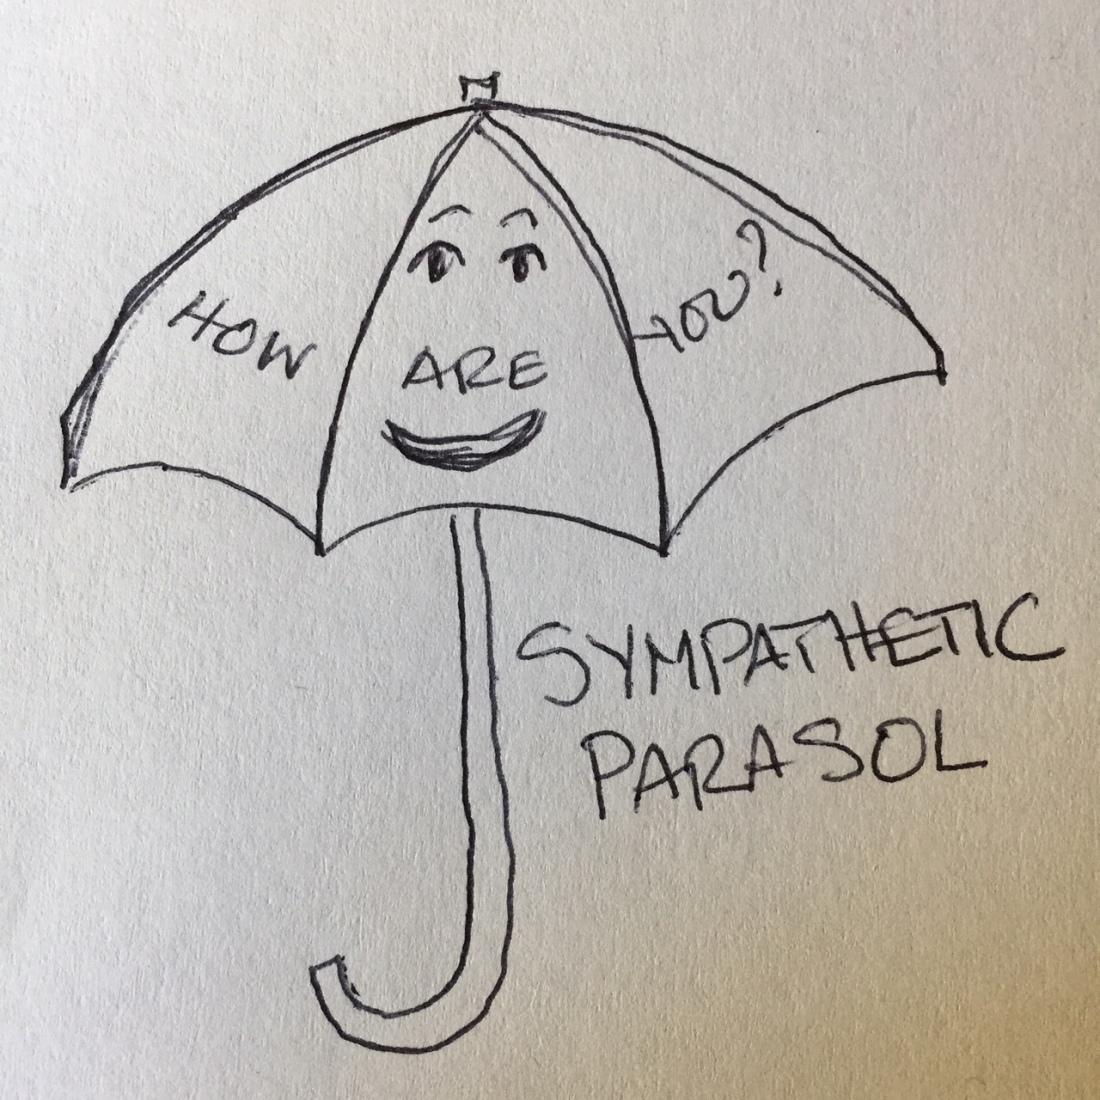 Sympathetic Parasol